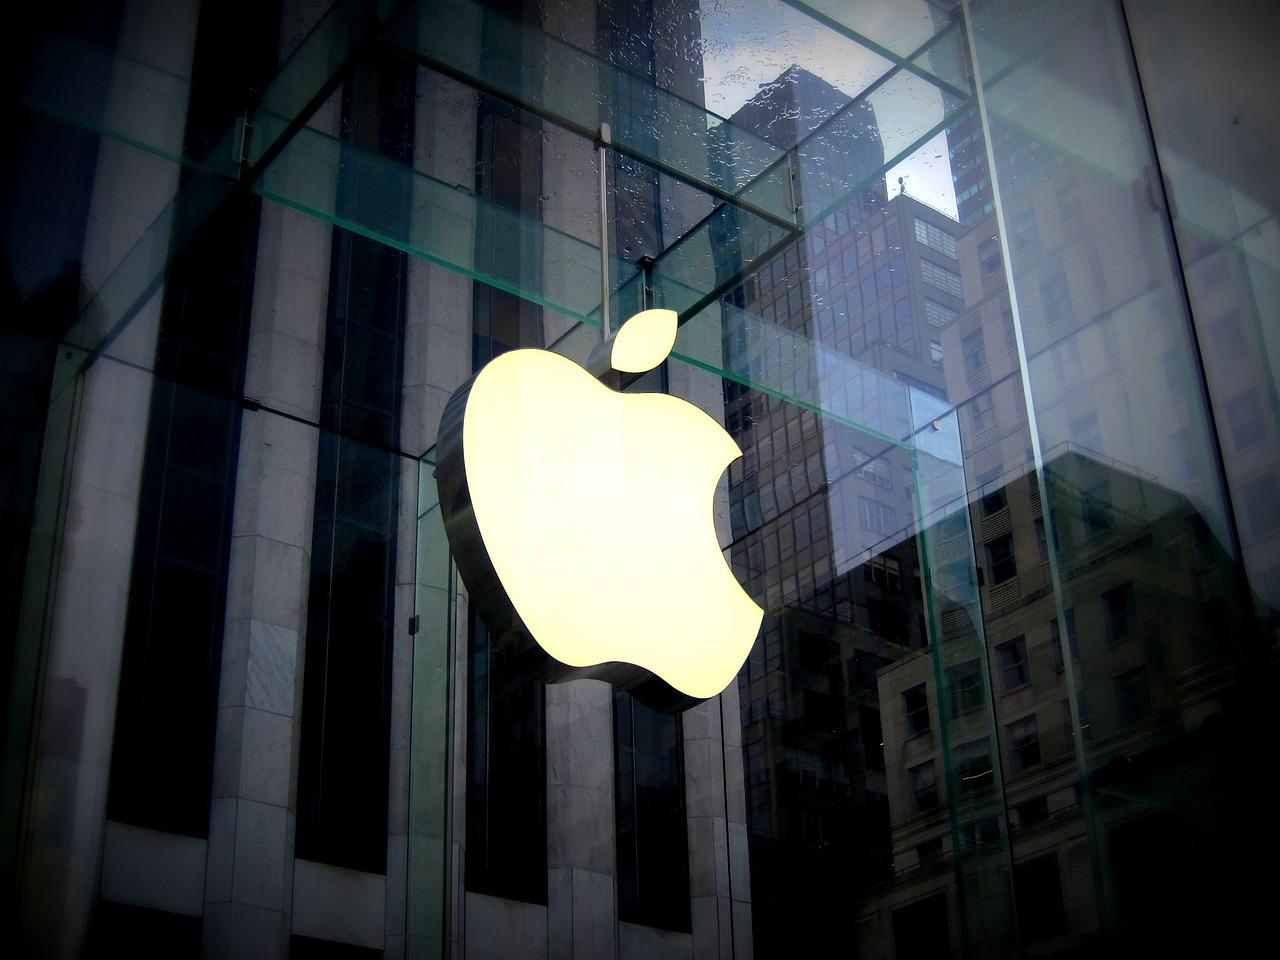 Apple Inc Mac Store - Free photo on Pixabay